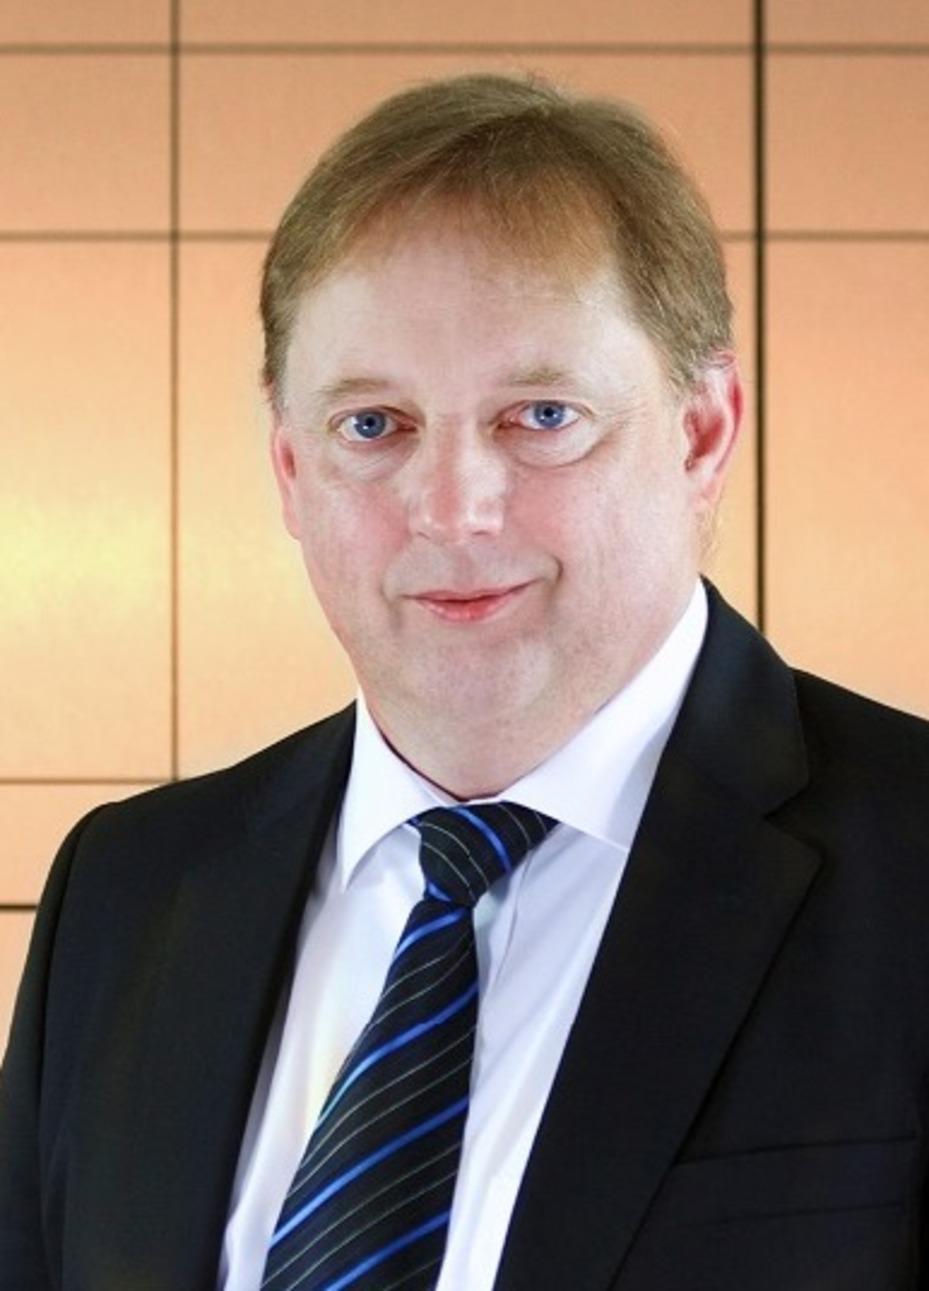 Niklas Dittberner